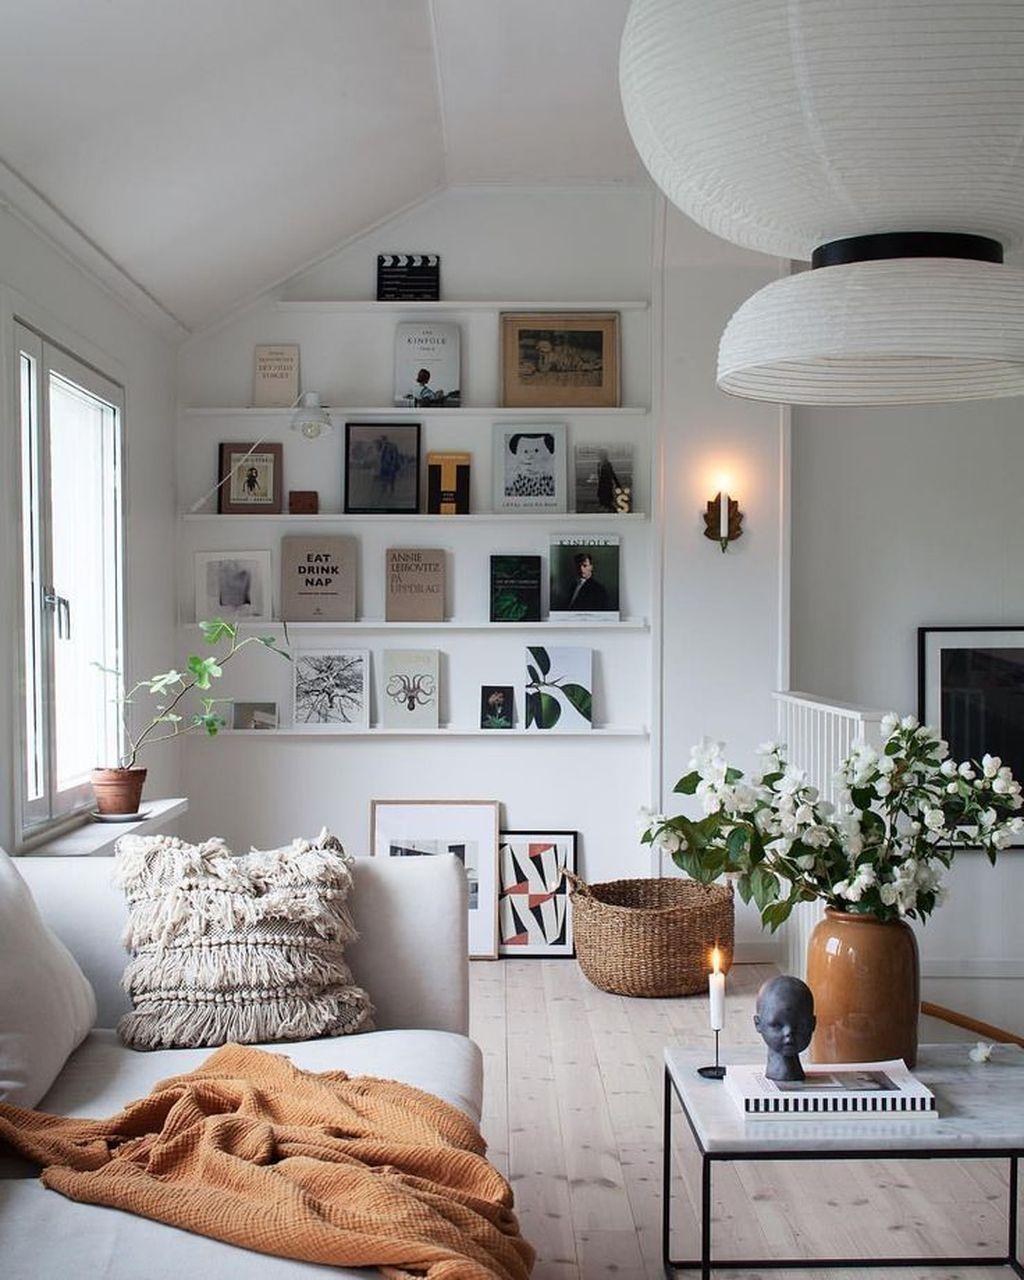 Amazing life plant decorations indoors home decor and furniture interior design garden also rh pinterest